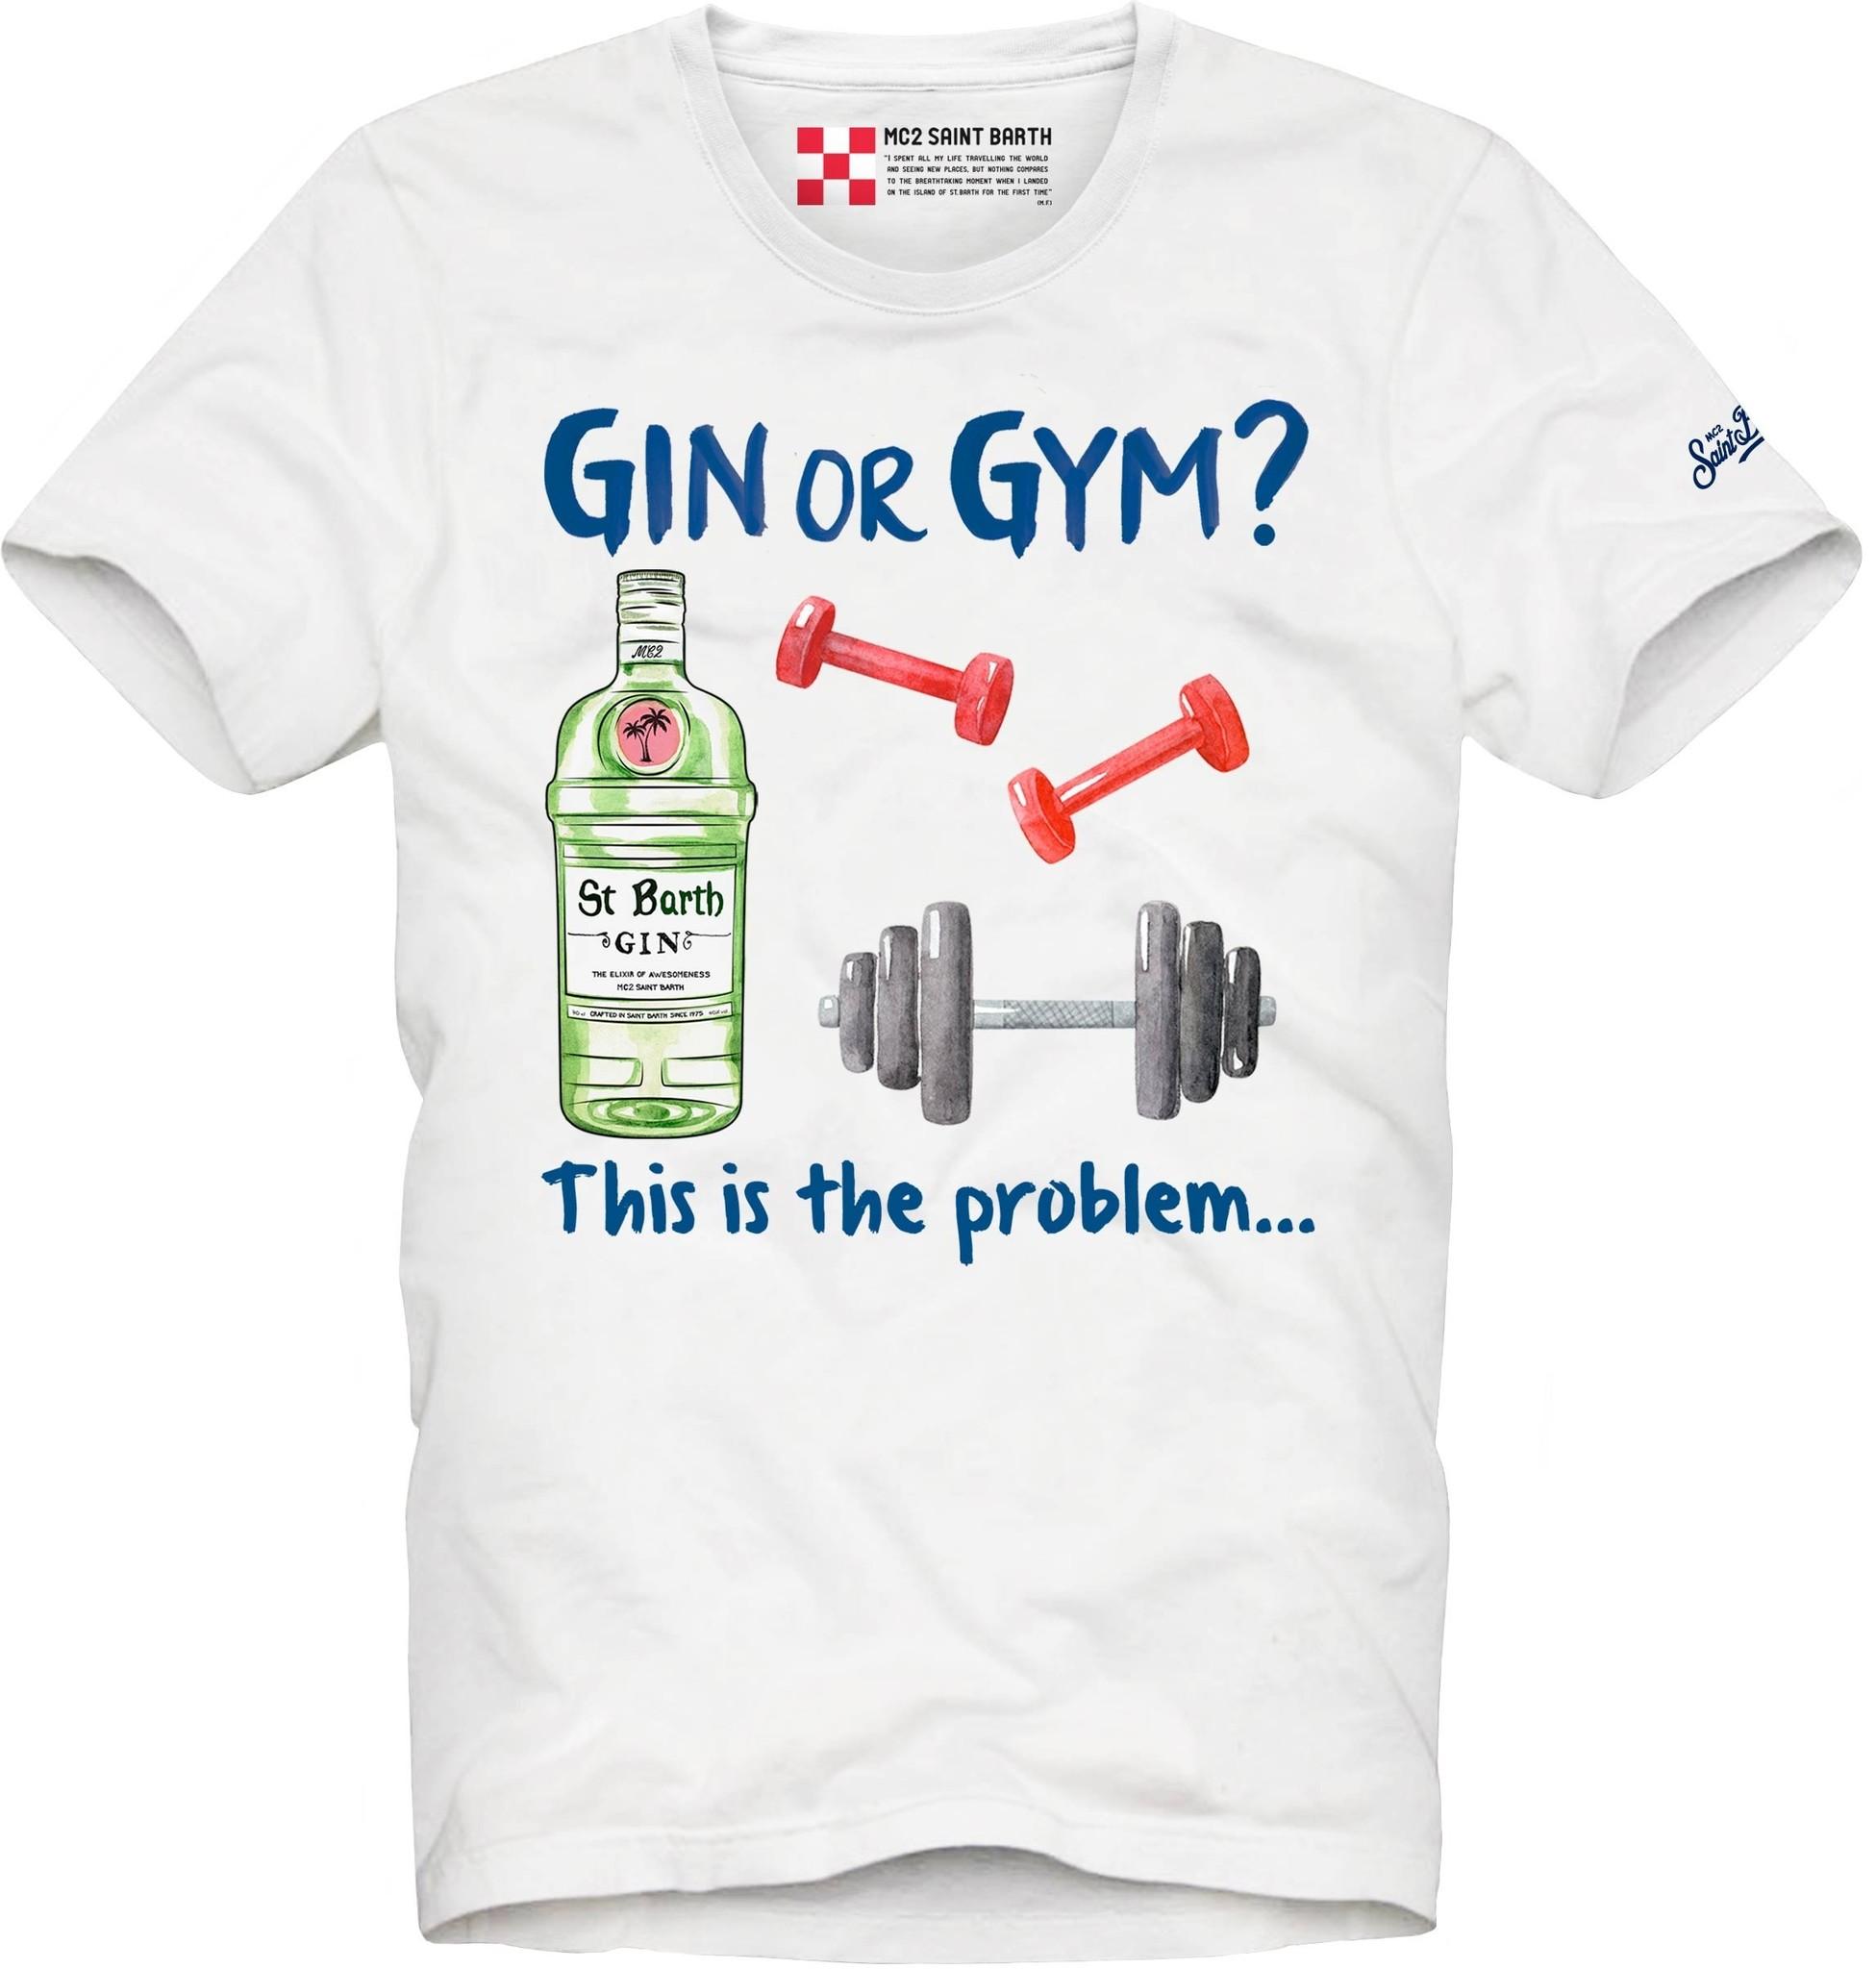 Gin or Gym T-Shirt-1